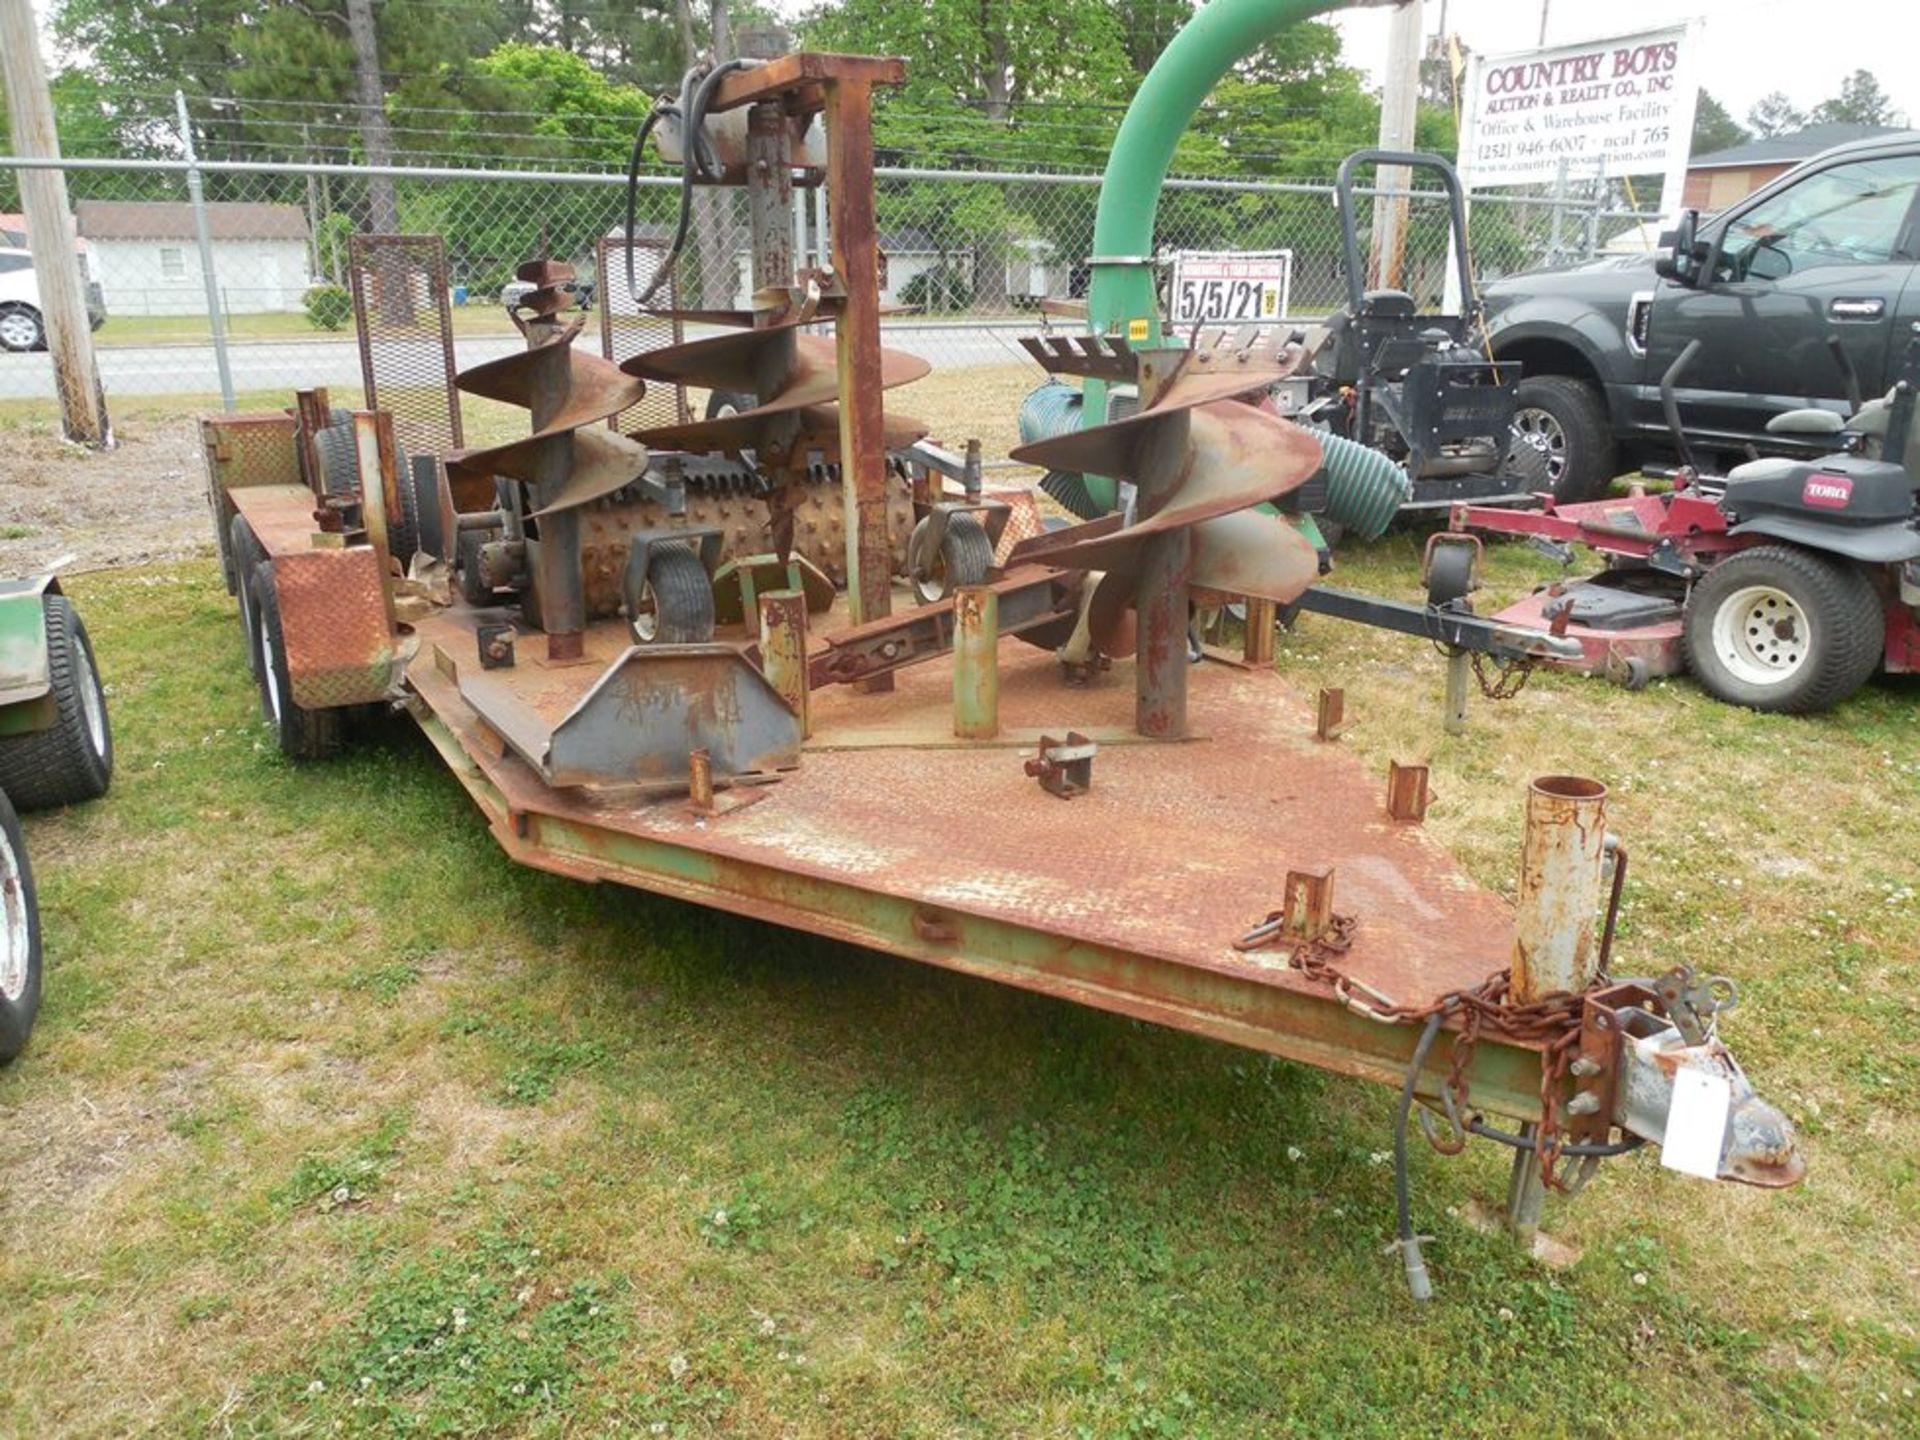 Power Trac PT-2425 Mini Skid Steer ser# 18928 with trailer, power rake, tree spade, front bucket, - Image 7 of 13